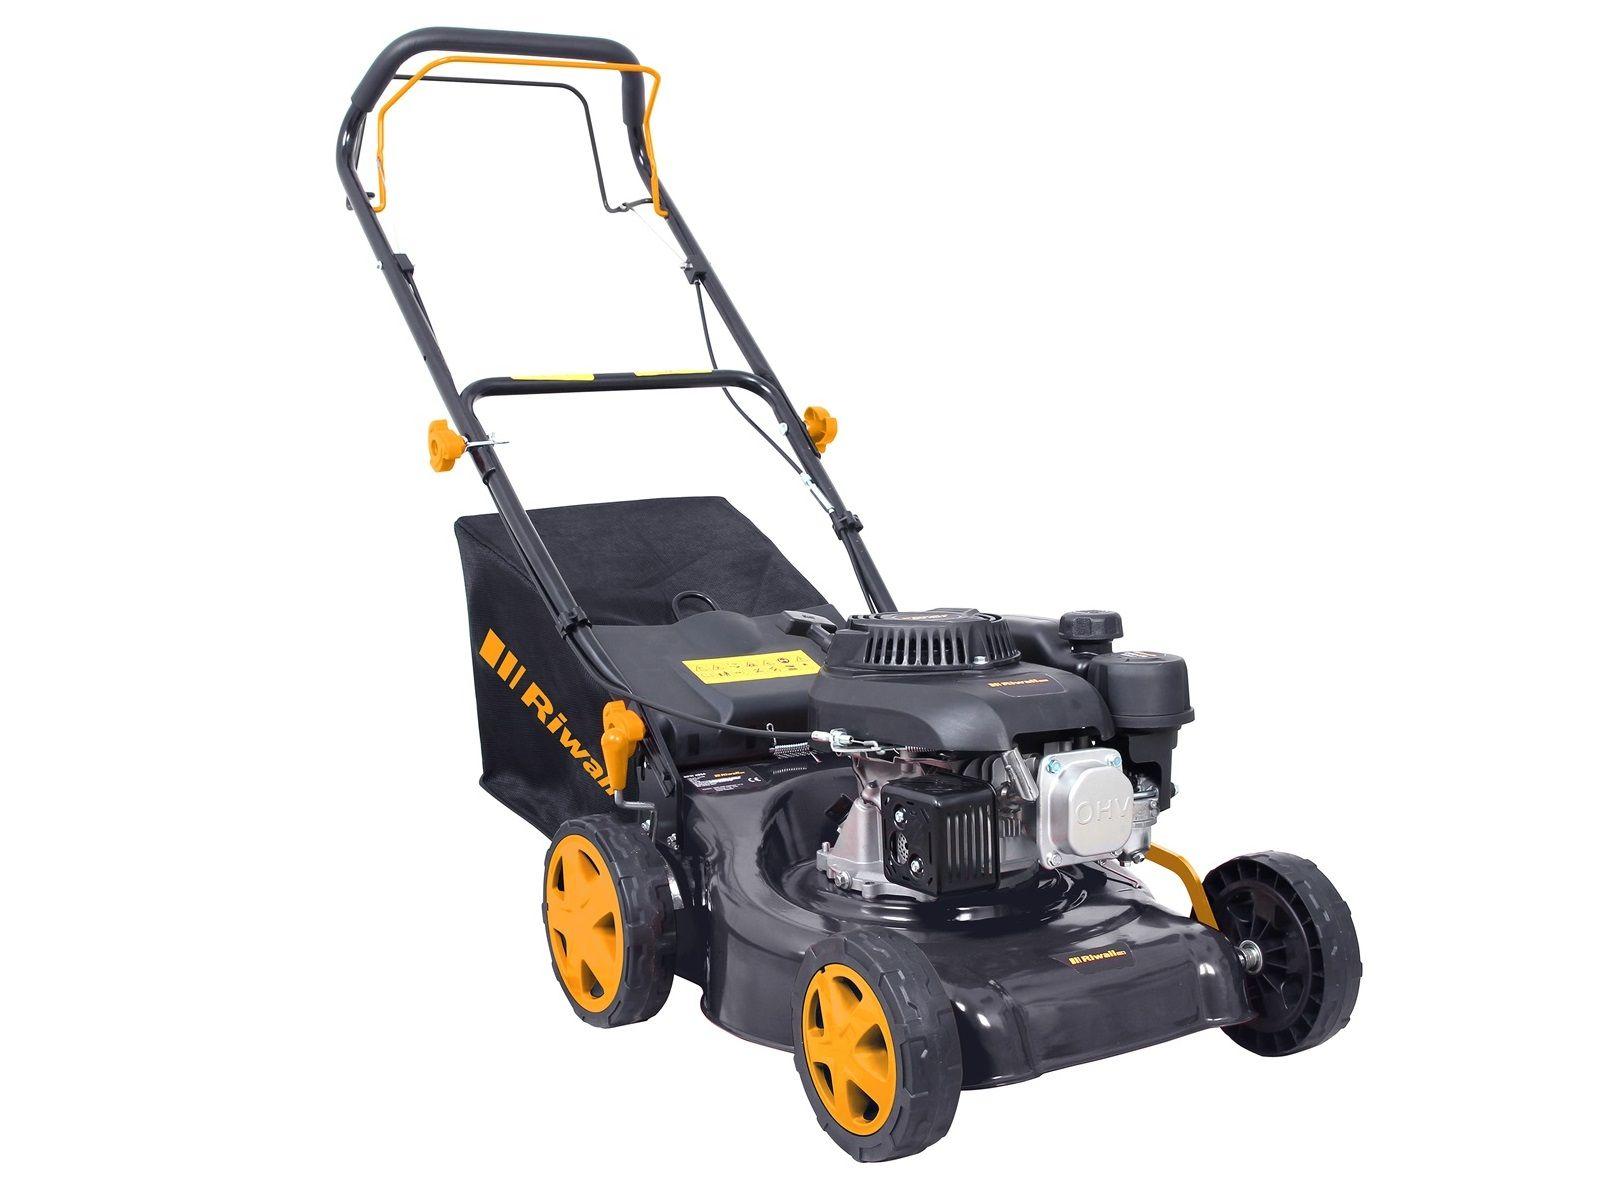 Benzinová sekačka na trávu s pojezdem Riwall PRO RPM 4234 - 132cm3, 40cm, 24.5kg (PM12B2001078A)